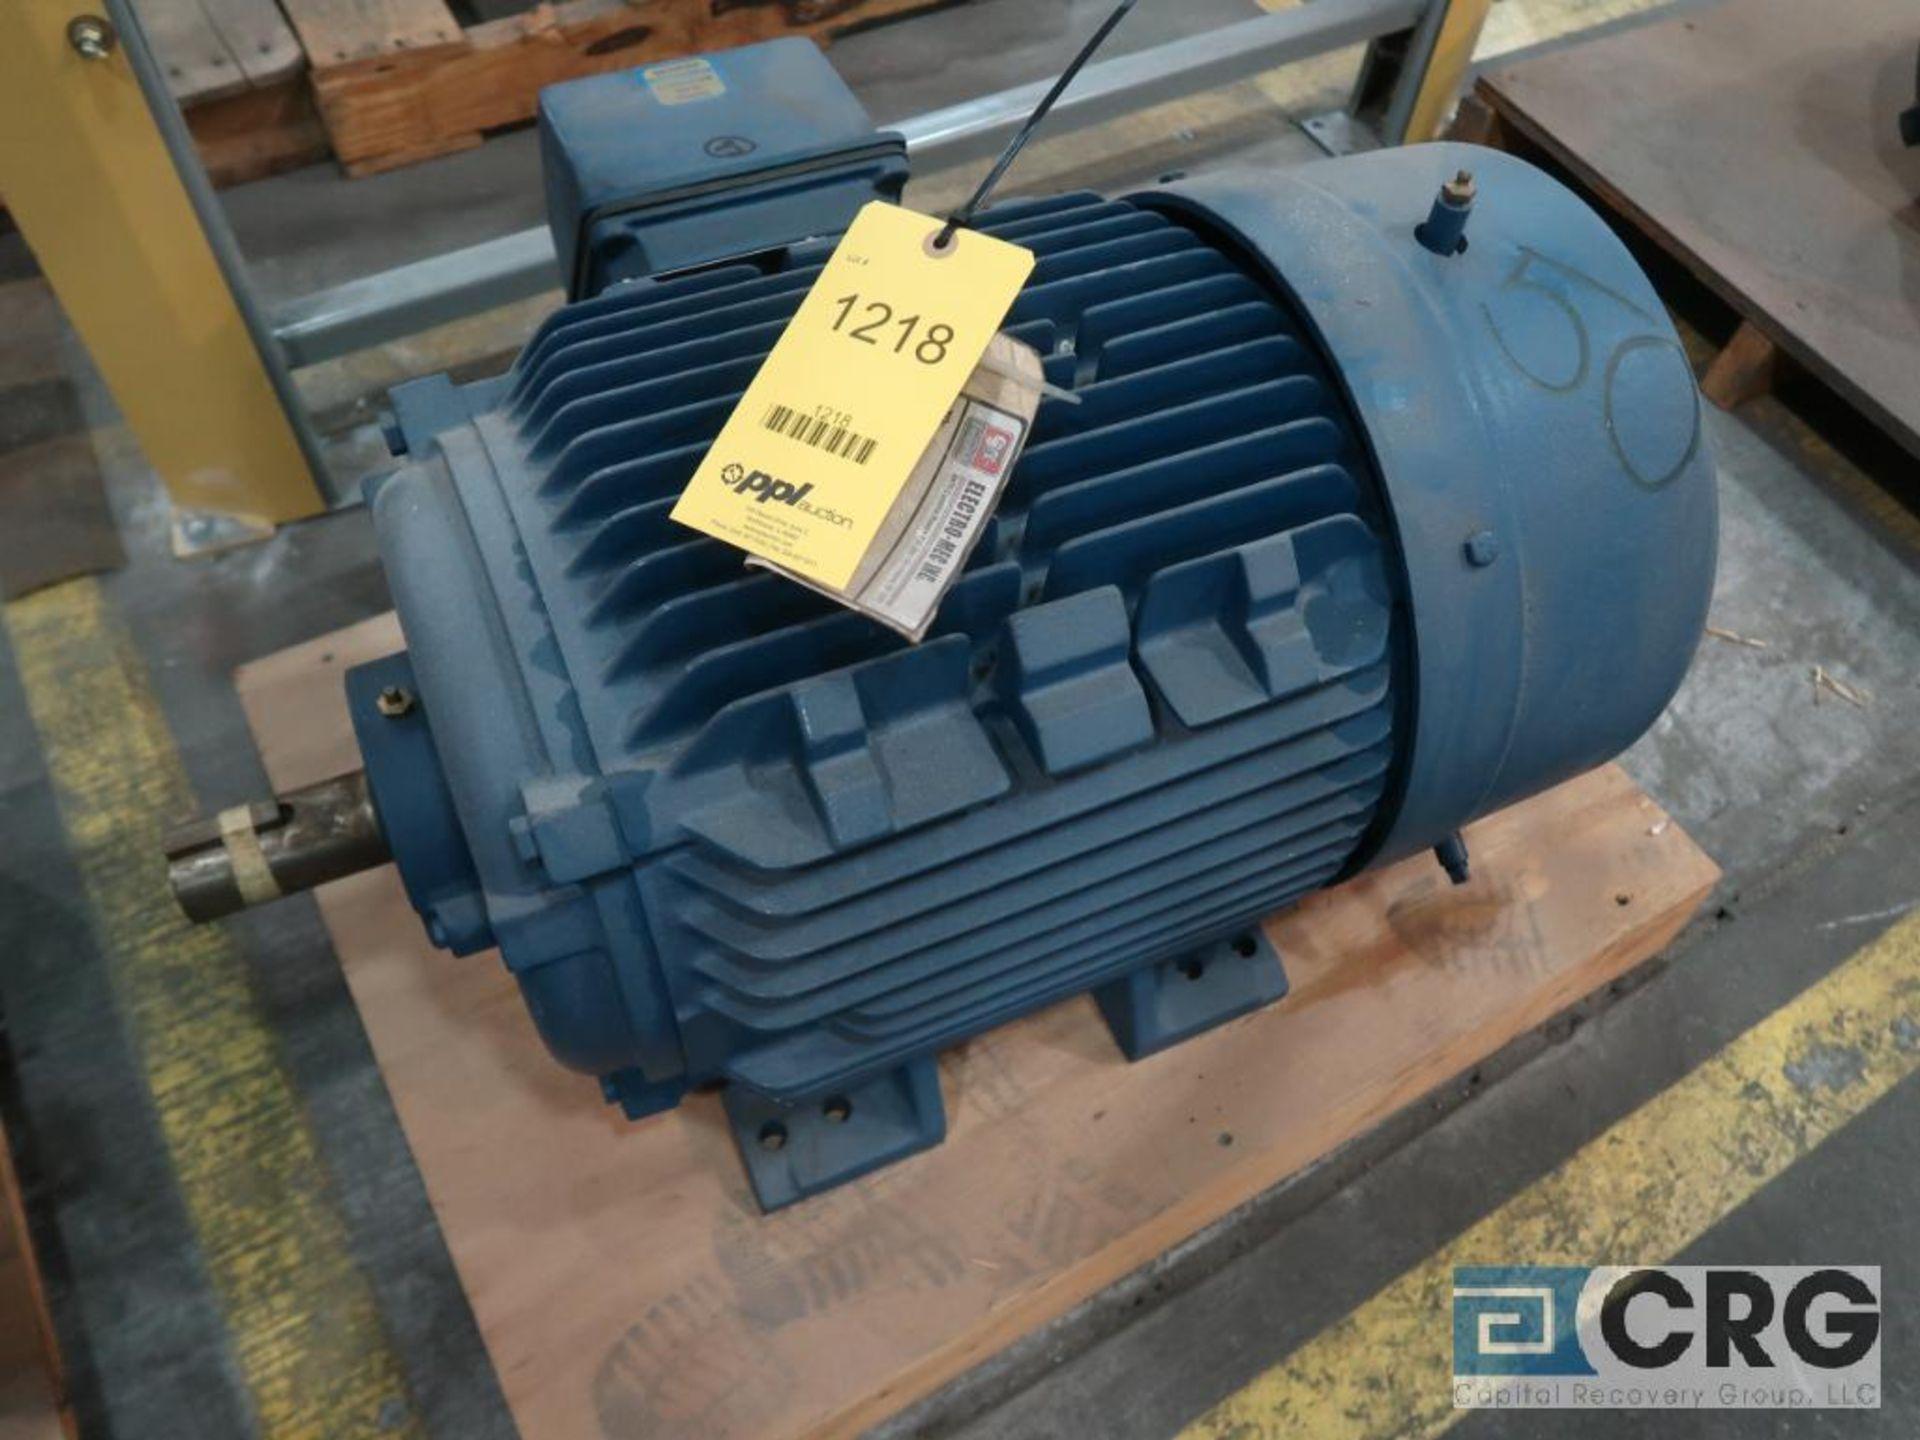 Siemens PE-21 PLUS motor, 50 HP, 3,530 RPMs, 460 volt, 3 ph., 326TS frame (Finish Building)